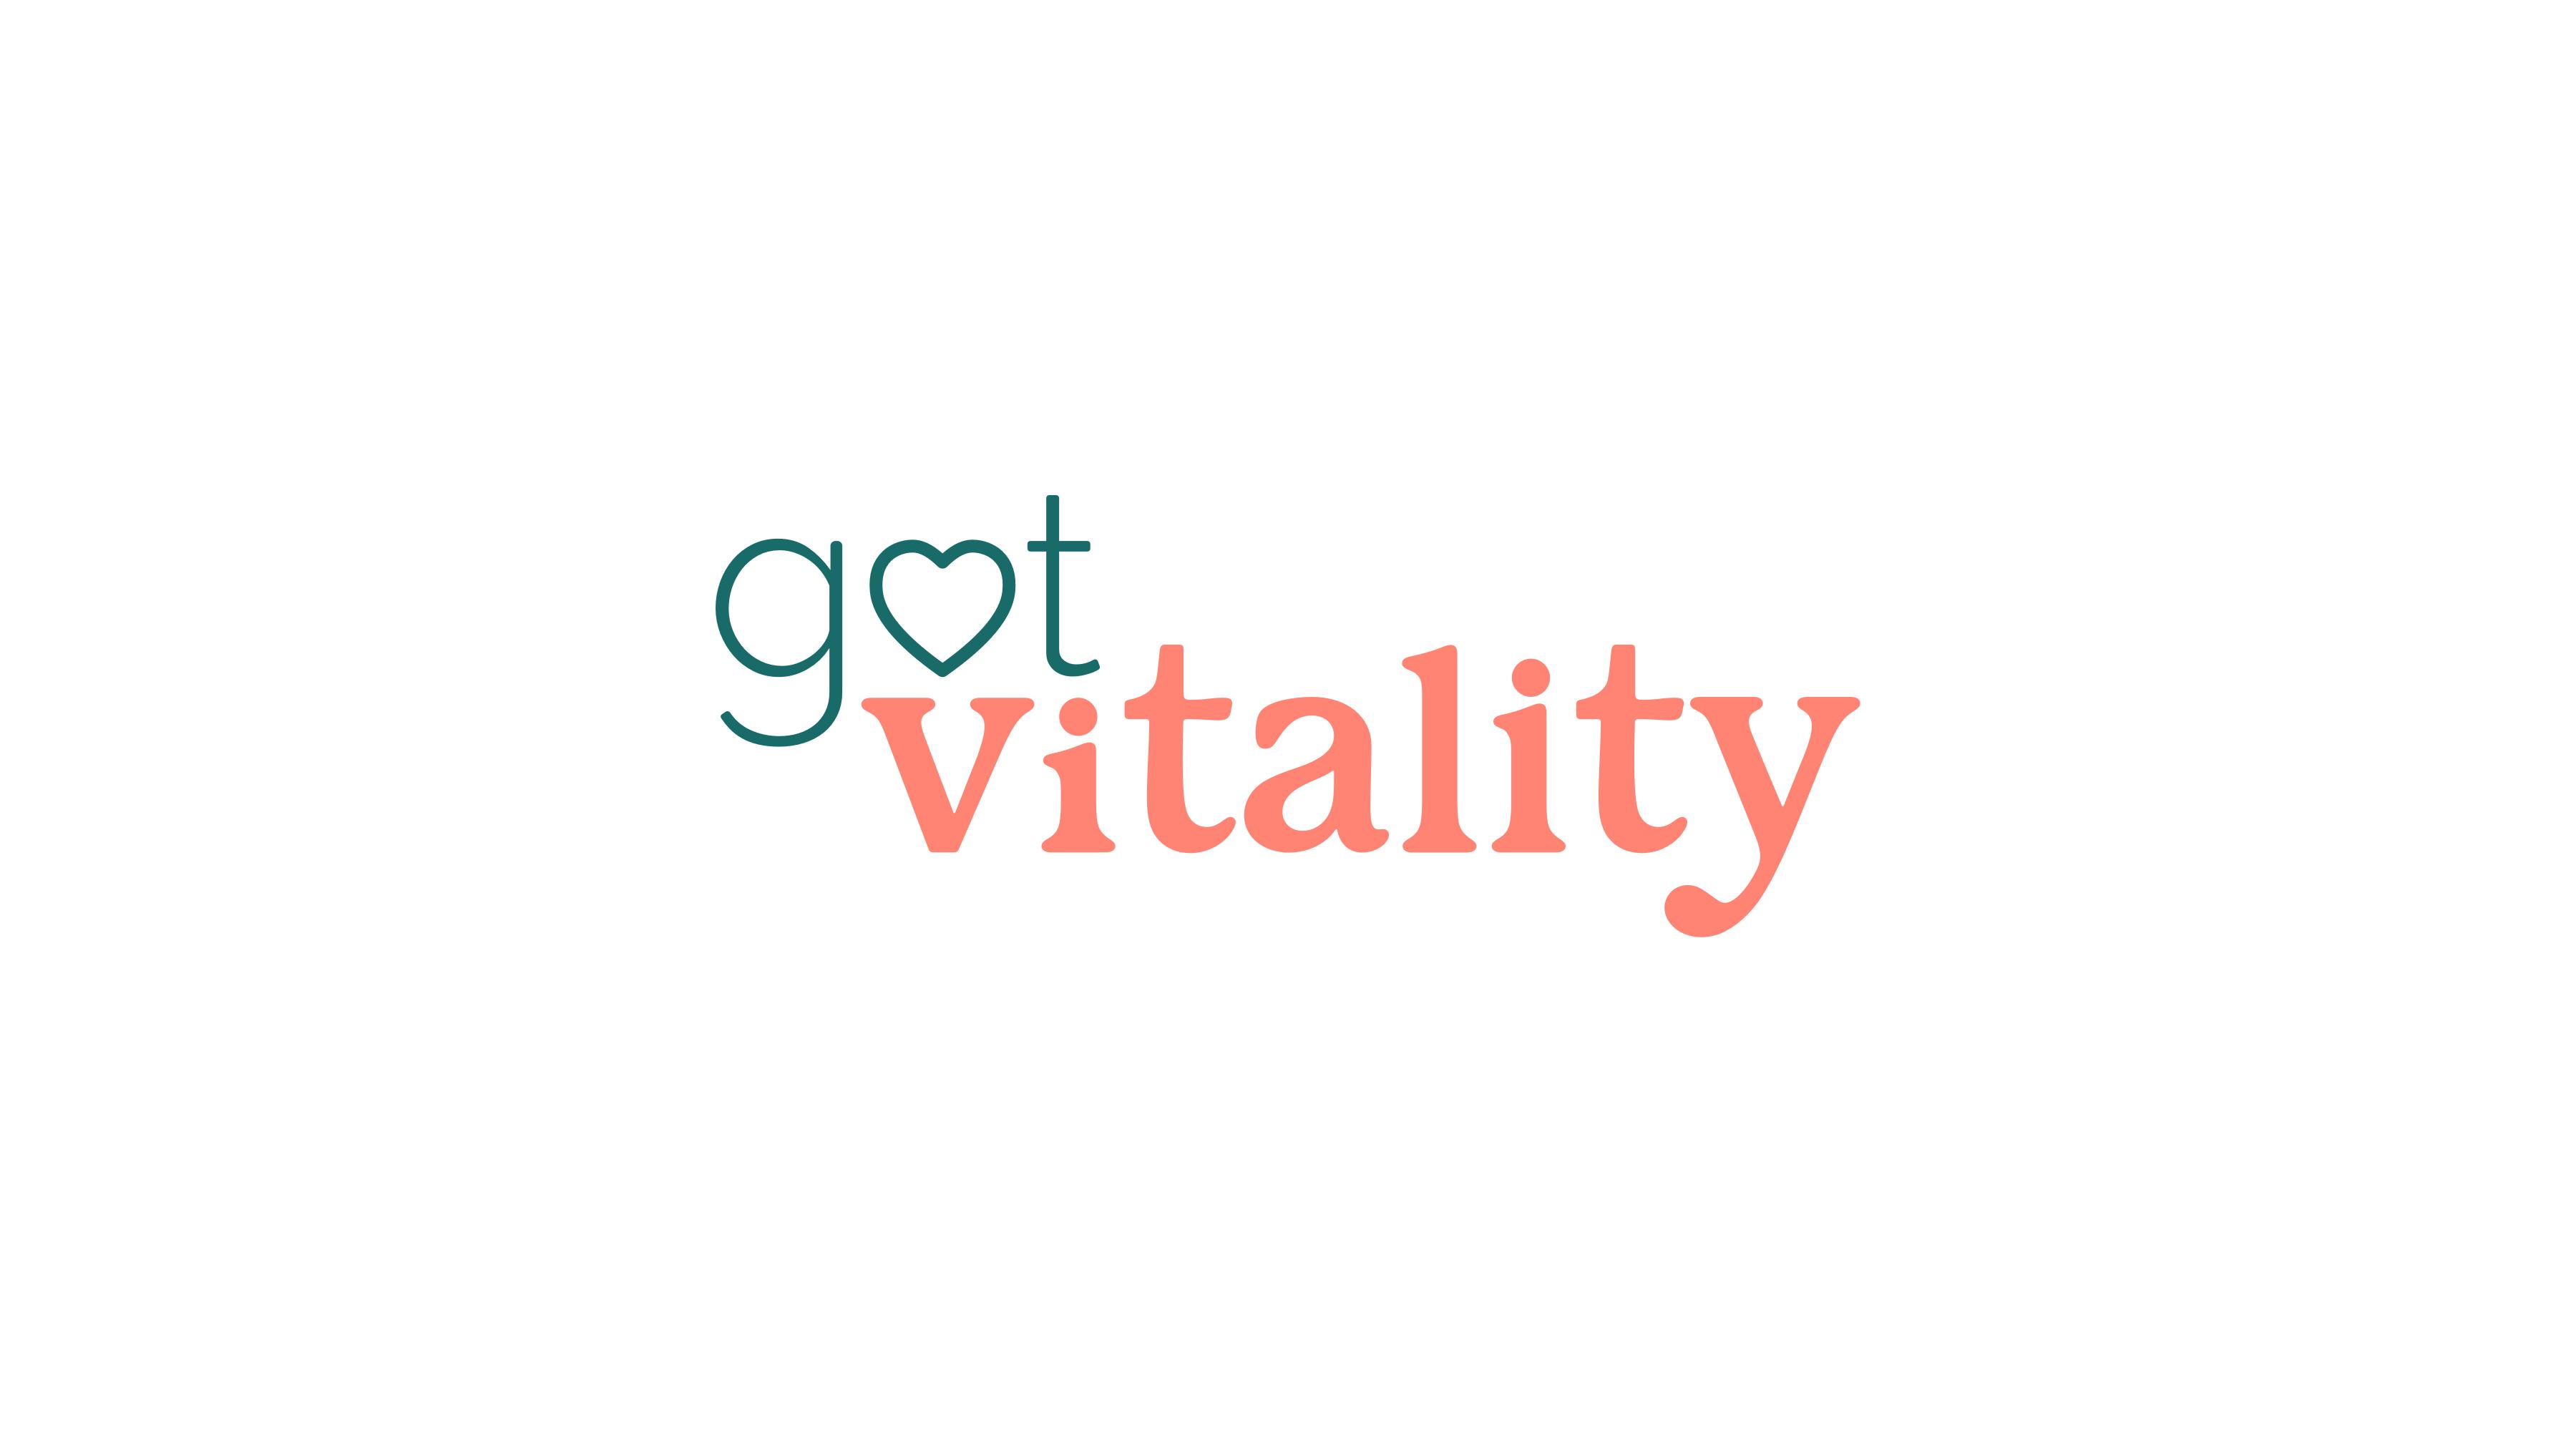 The new Got Vitality logo